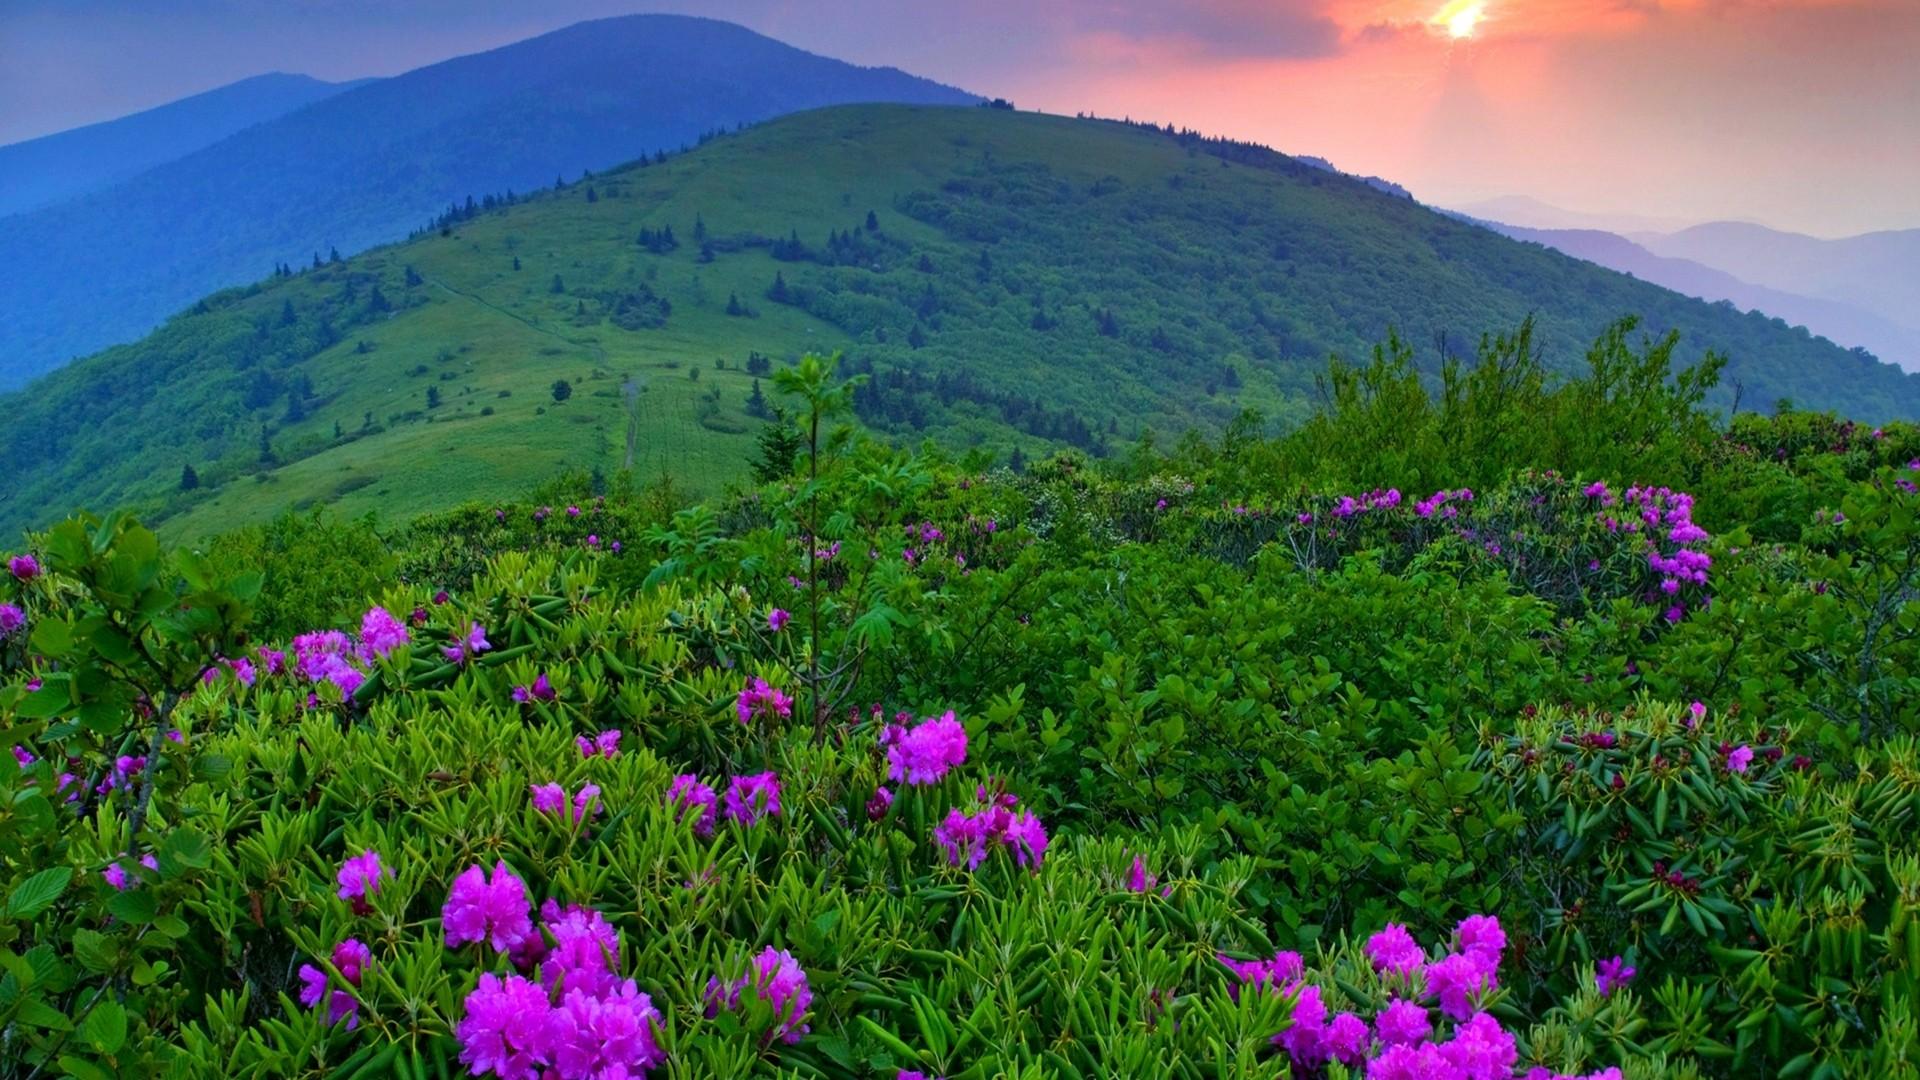 Must see Wallpaper Mountain Flower - landscape-mountains-flowers-field-wilderness-purple-flowers-plateau-mountain-flower-grassland-plant-flora-pasture-vegetation-meadow-wildflower-prairie-habitat-natural-environment-mountainous-landforms-ecosystem-shrub-mountain-range-185189  Snapshot_303771.jpg